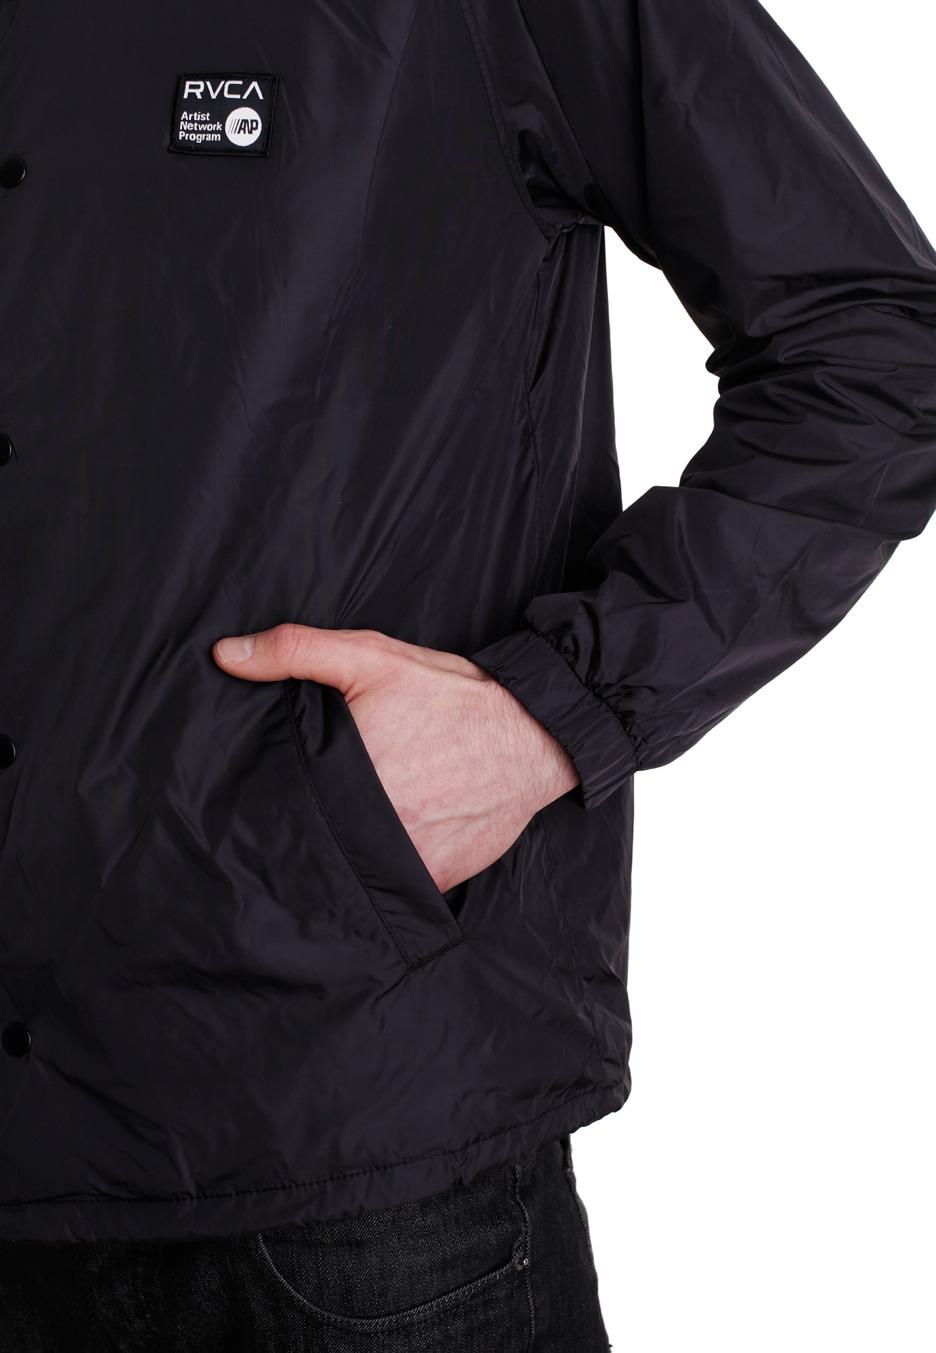 Boutique Coaches Streetwear Veste Rvca Fr Anp qzaOYfxA